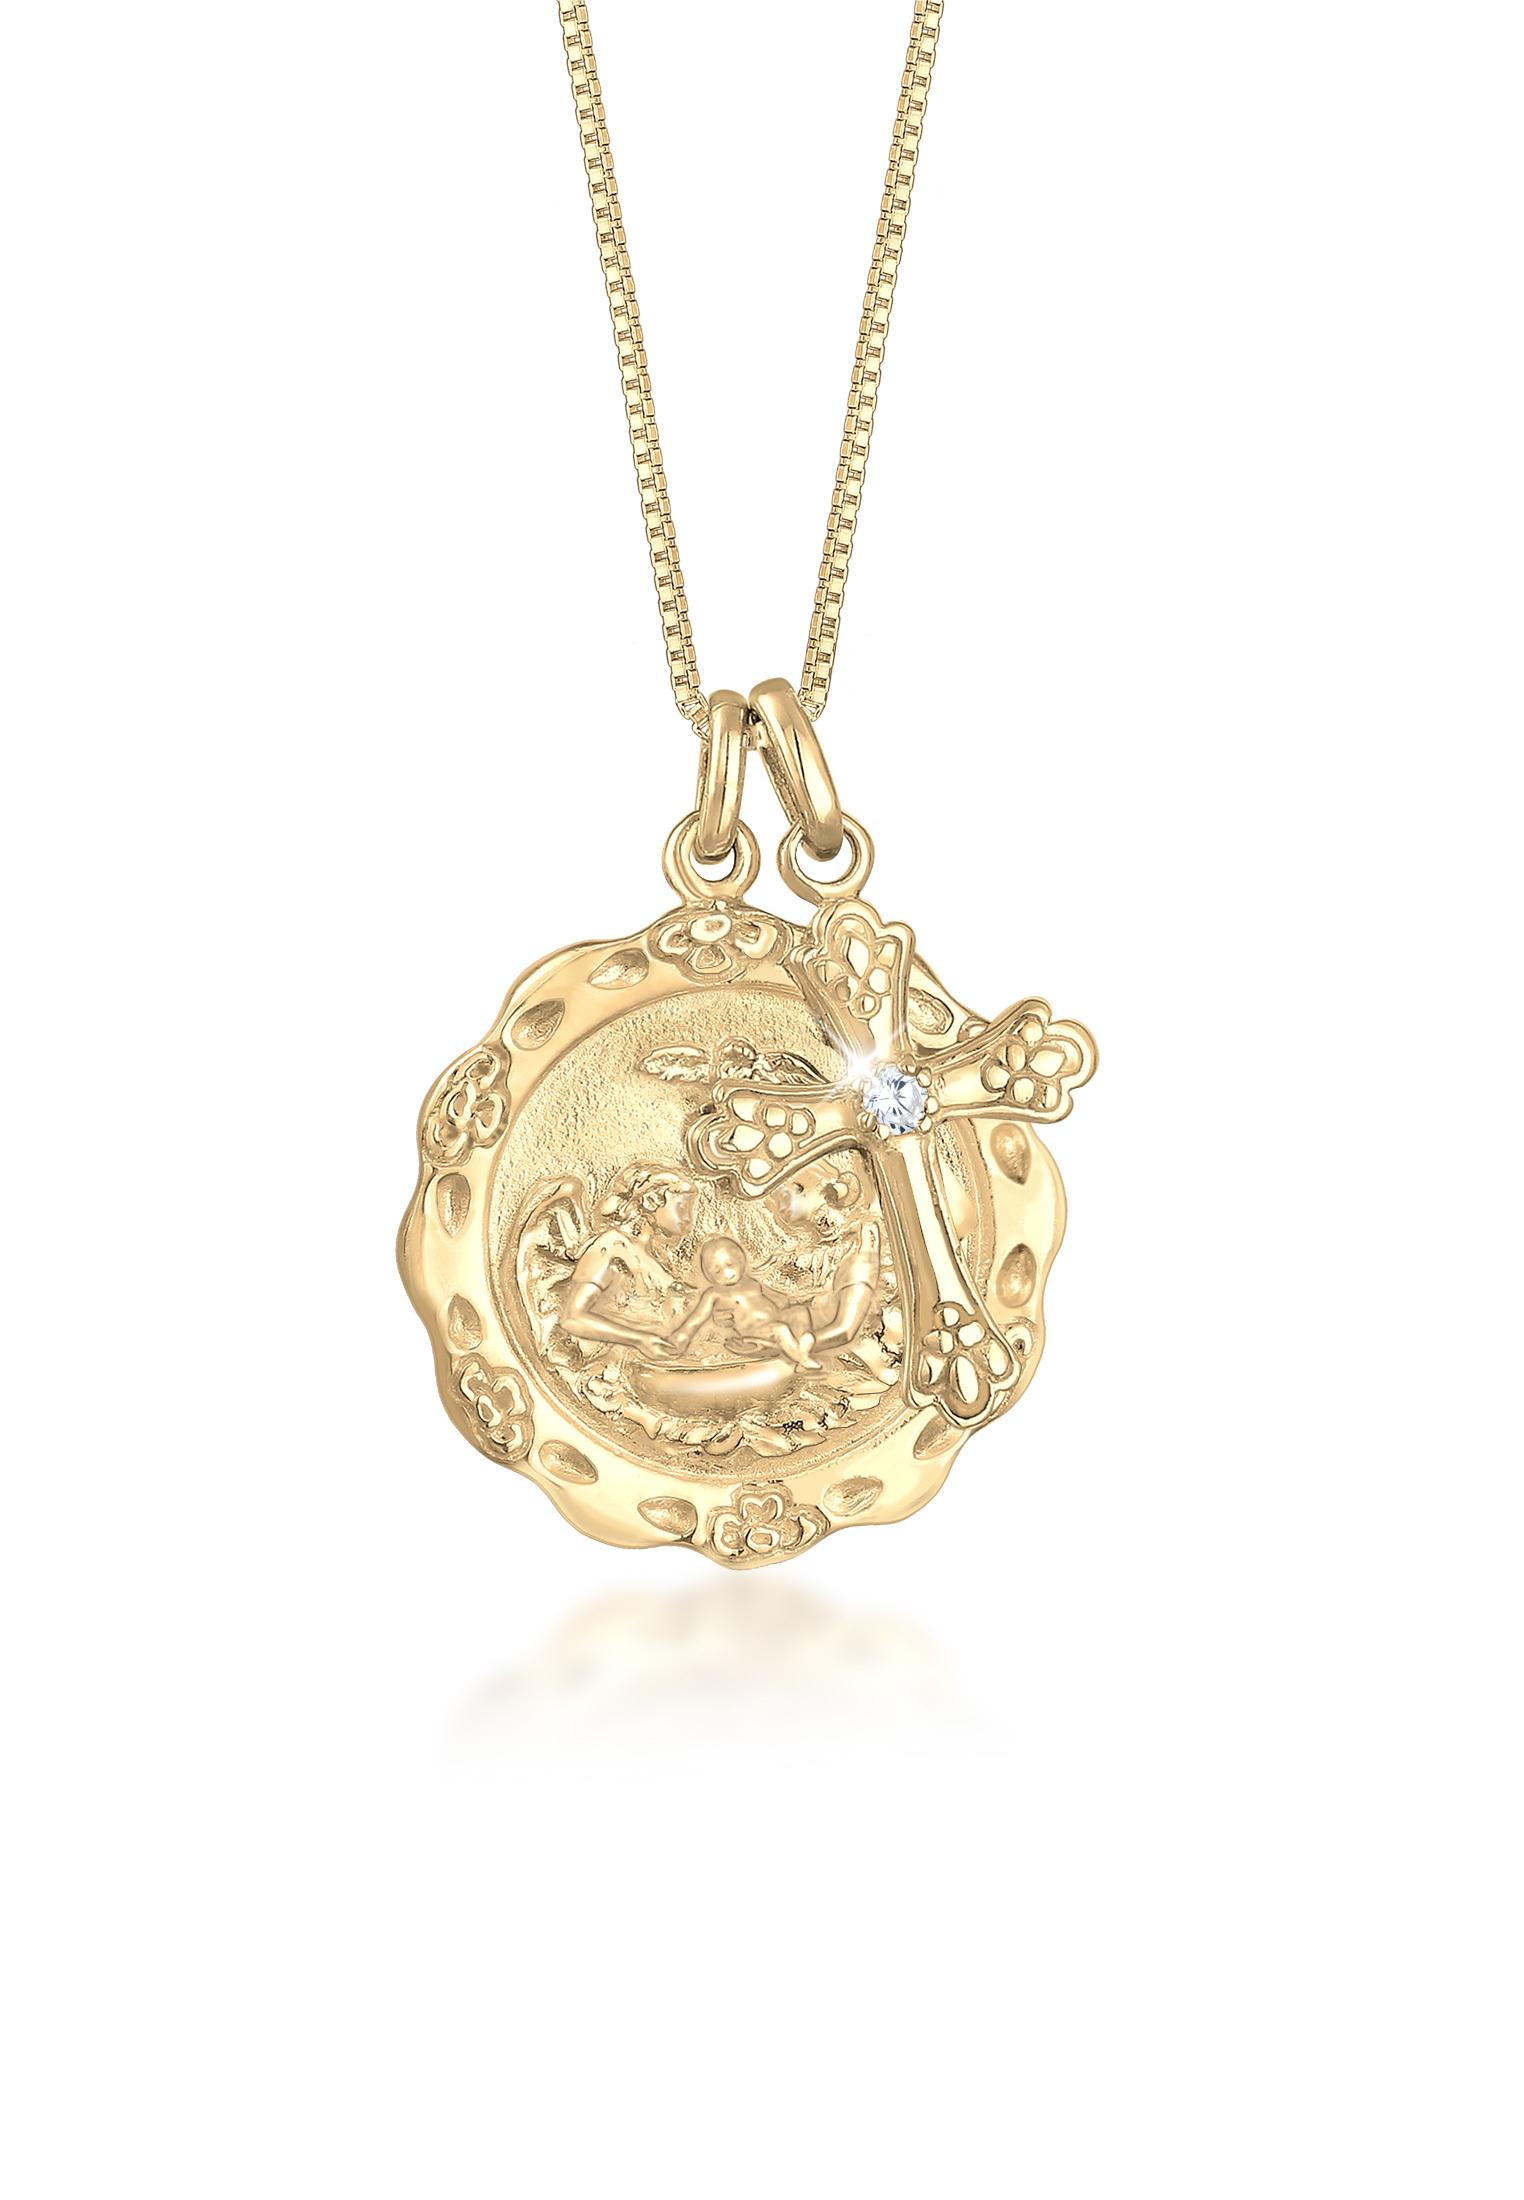 Lange Venezianer-Halskette Kreuz | Zirkonia ( Weiß ) | 925 Sterling Silber vergoldet